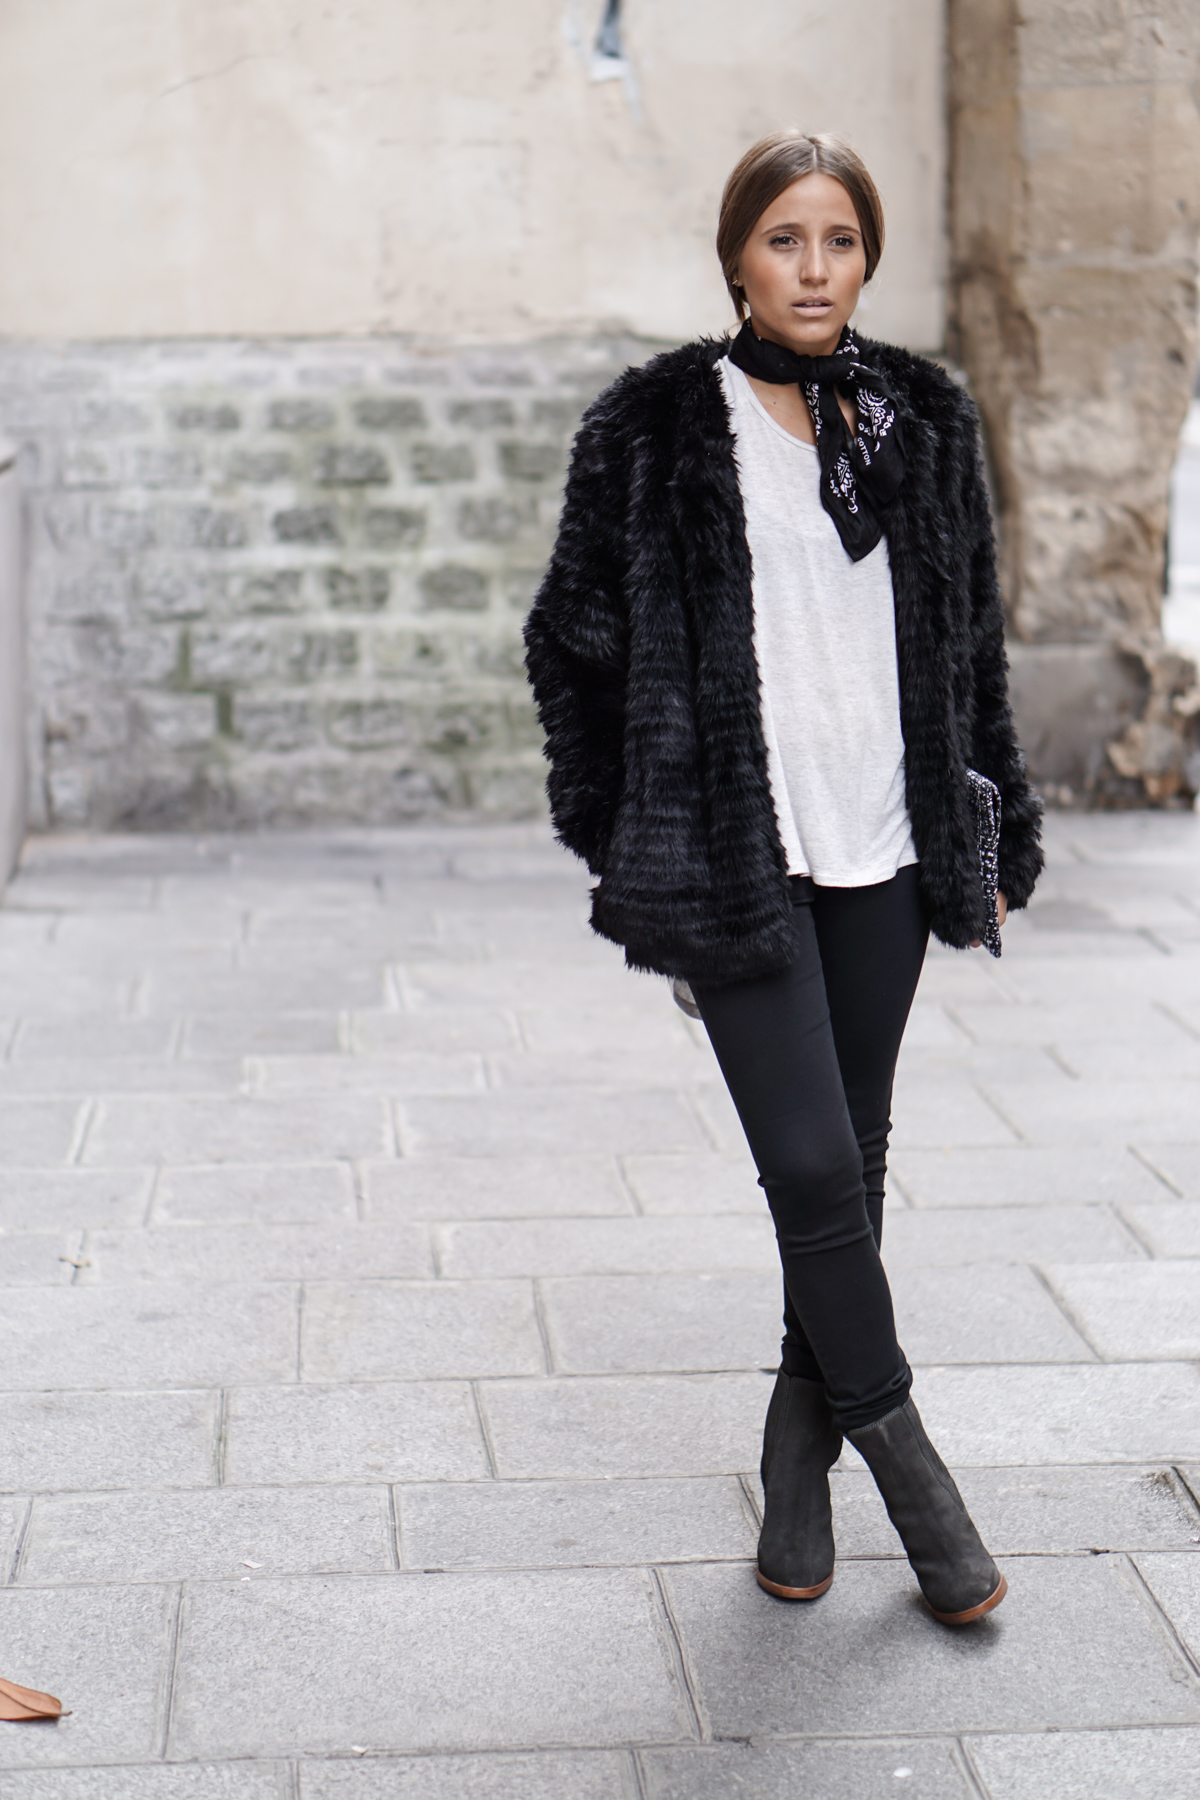 Manteau Faux Fur N O H O L I T A